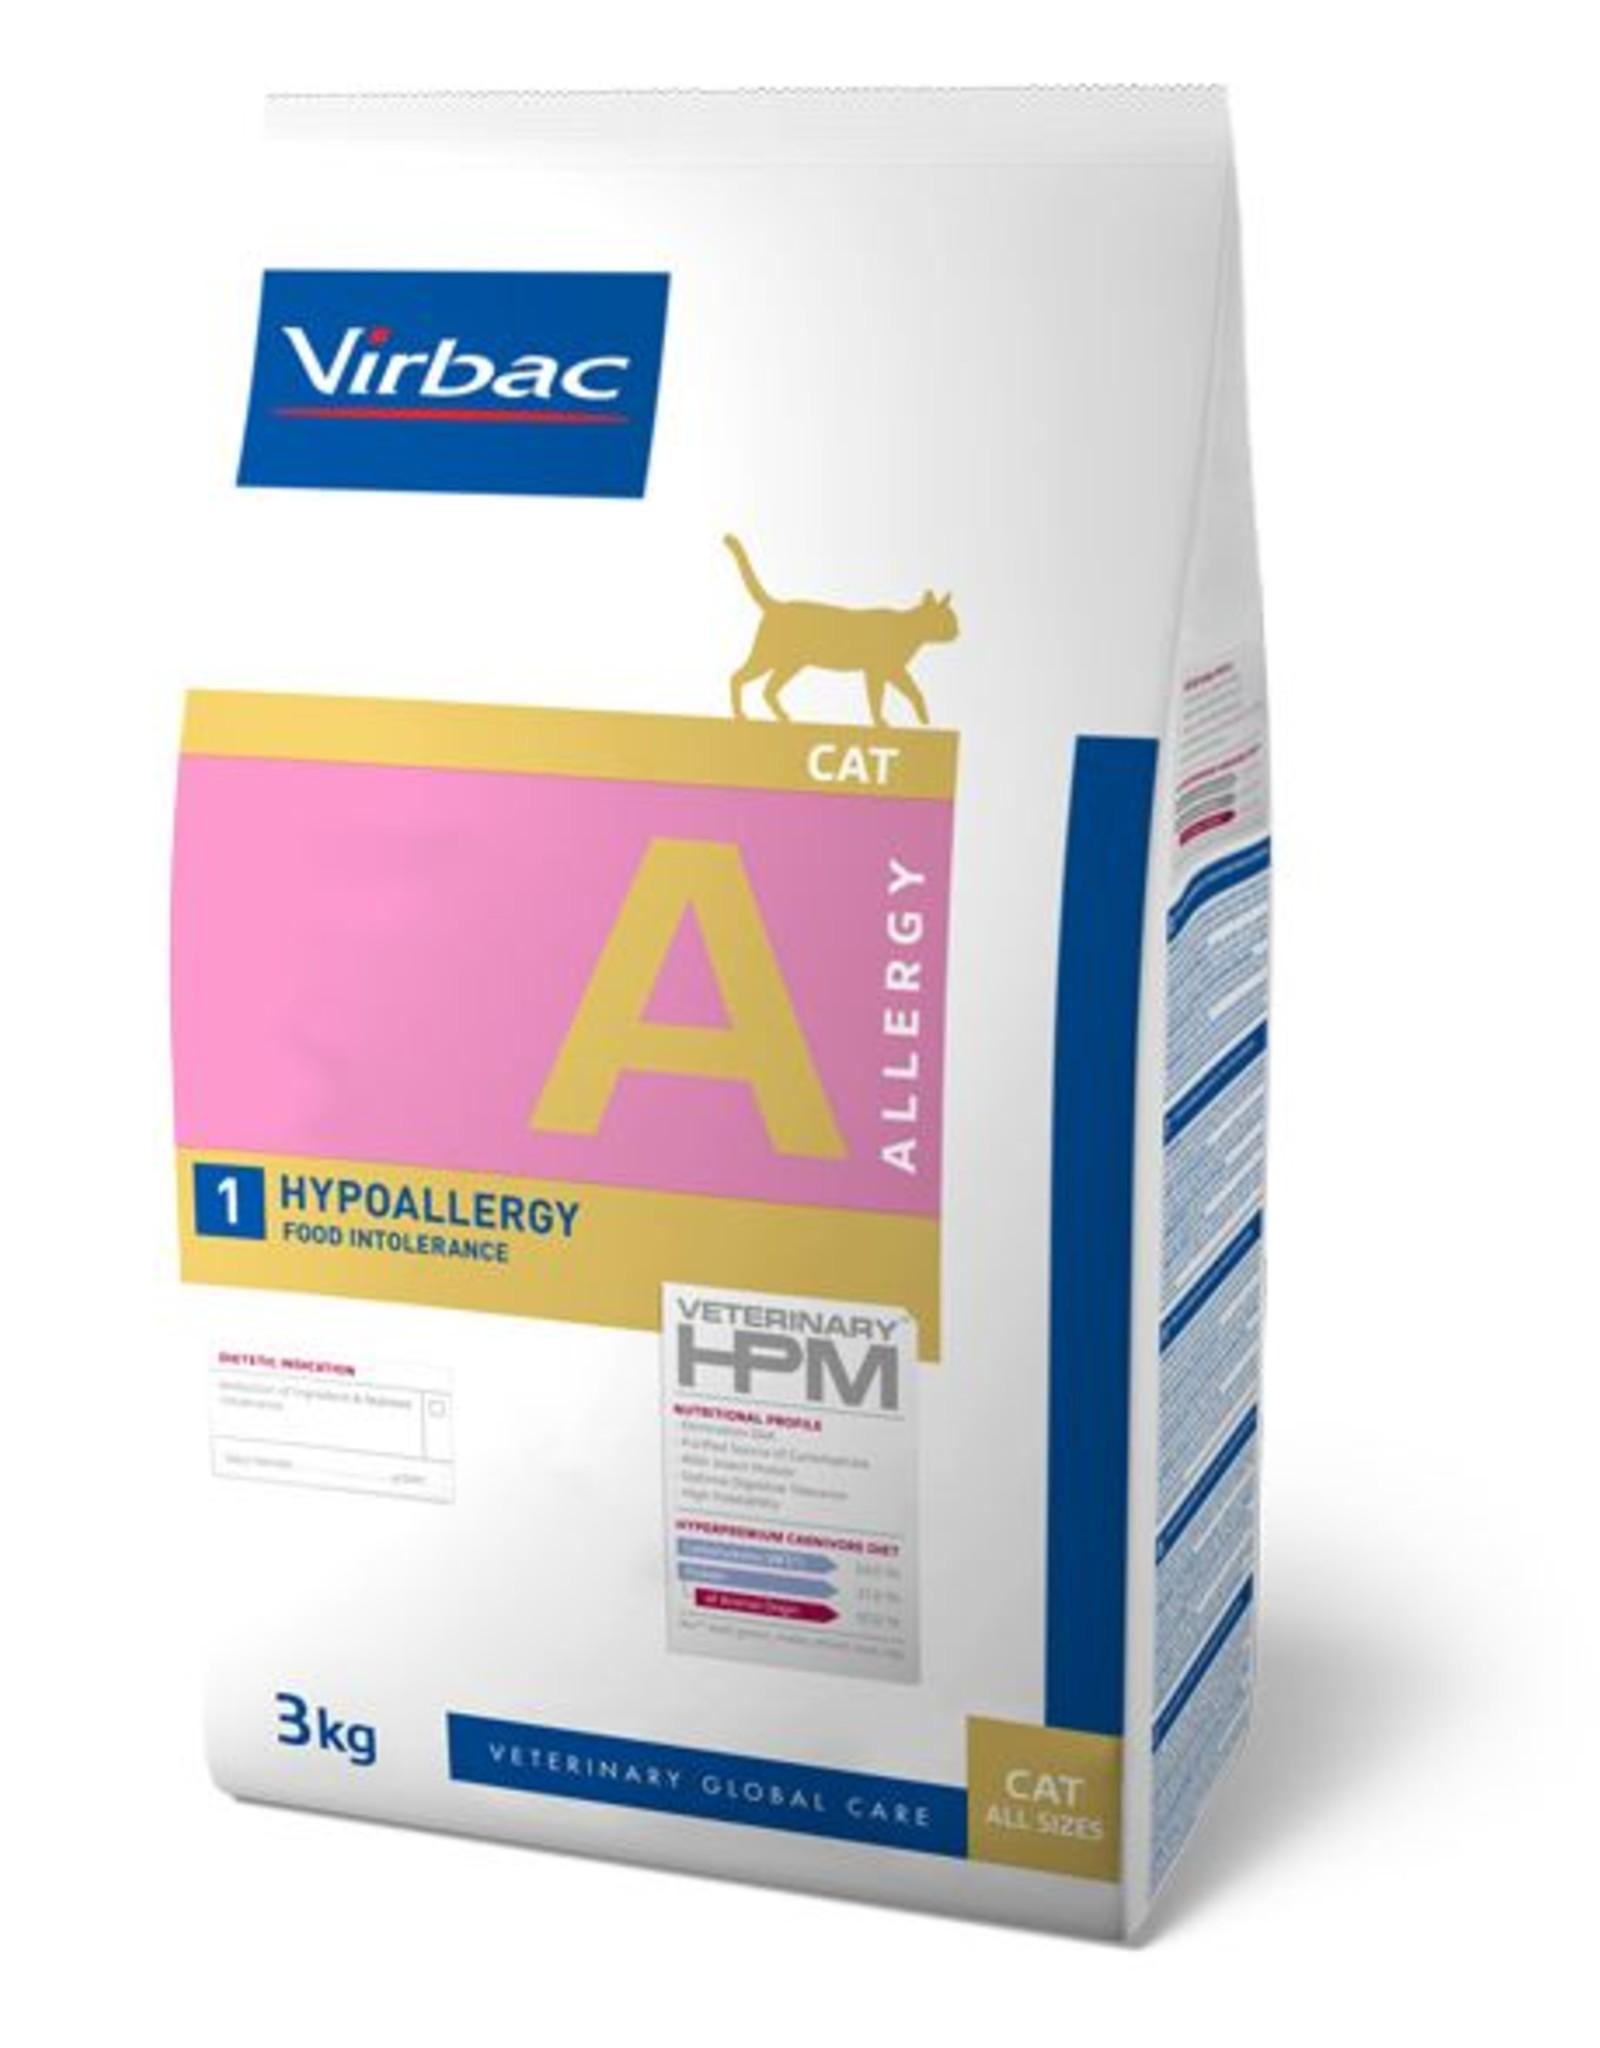 Virbac Virbac Hpm Kat Hypo Allergy A1 3kg